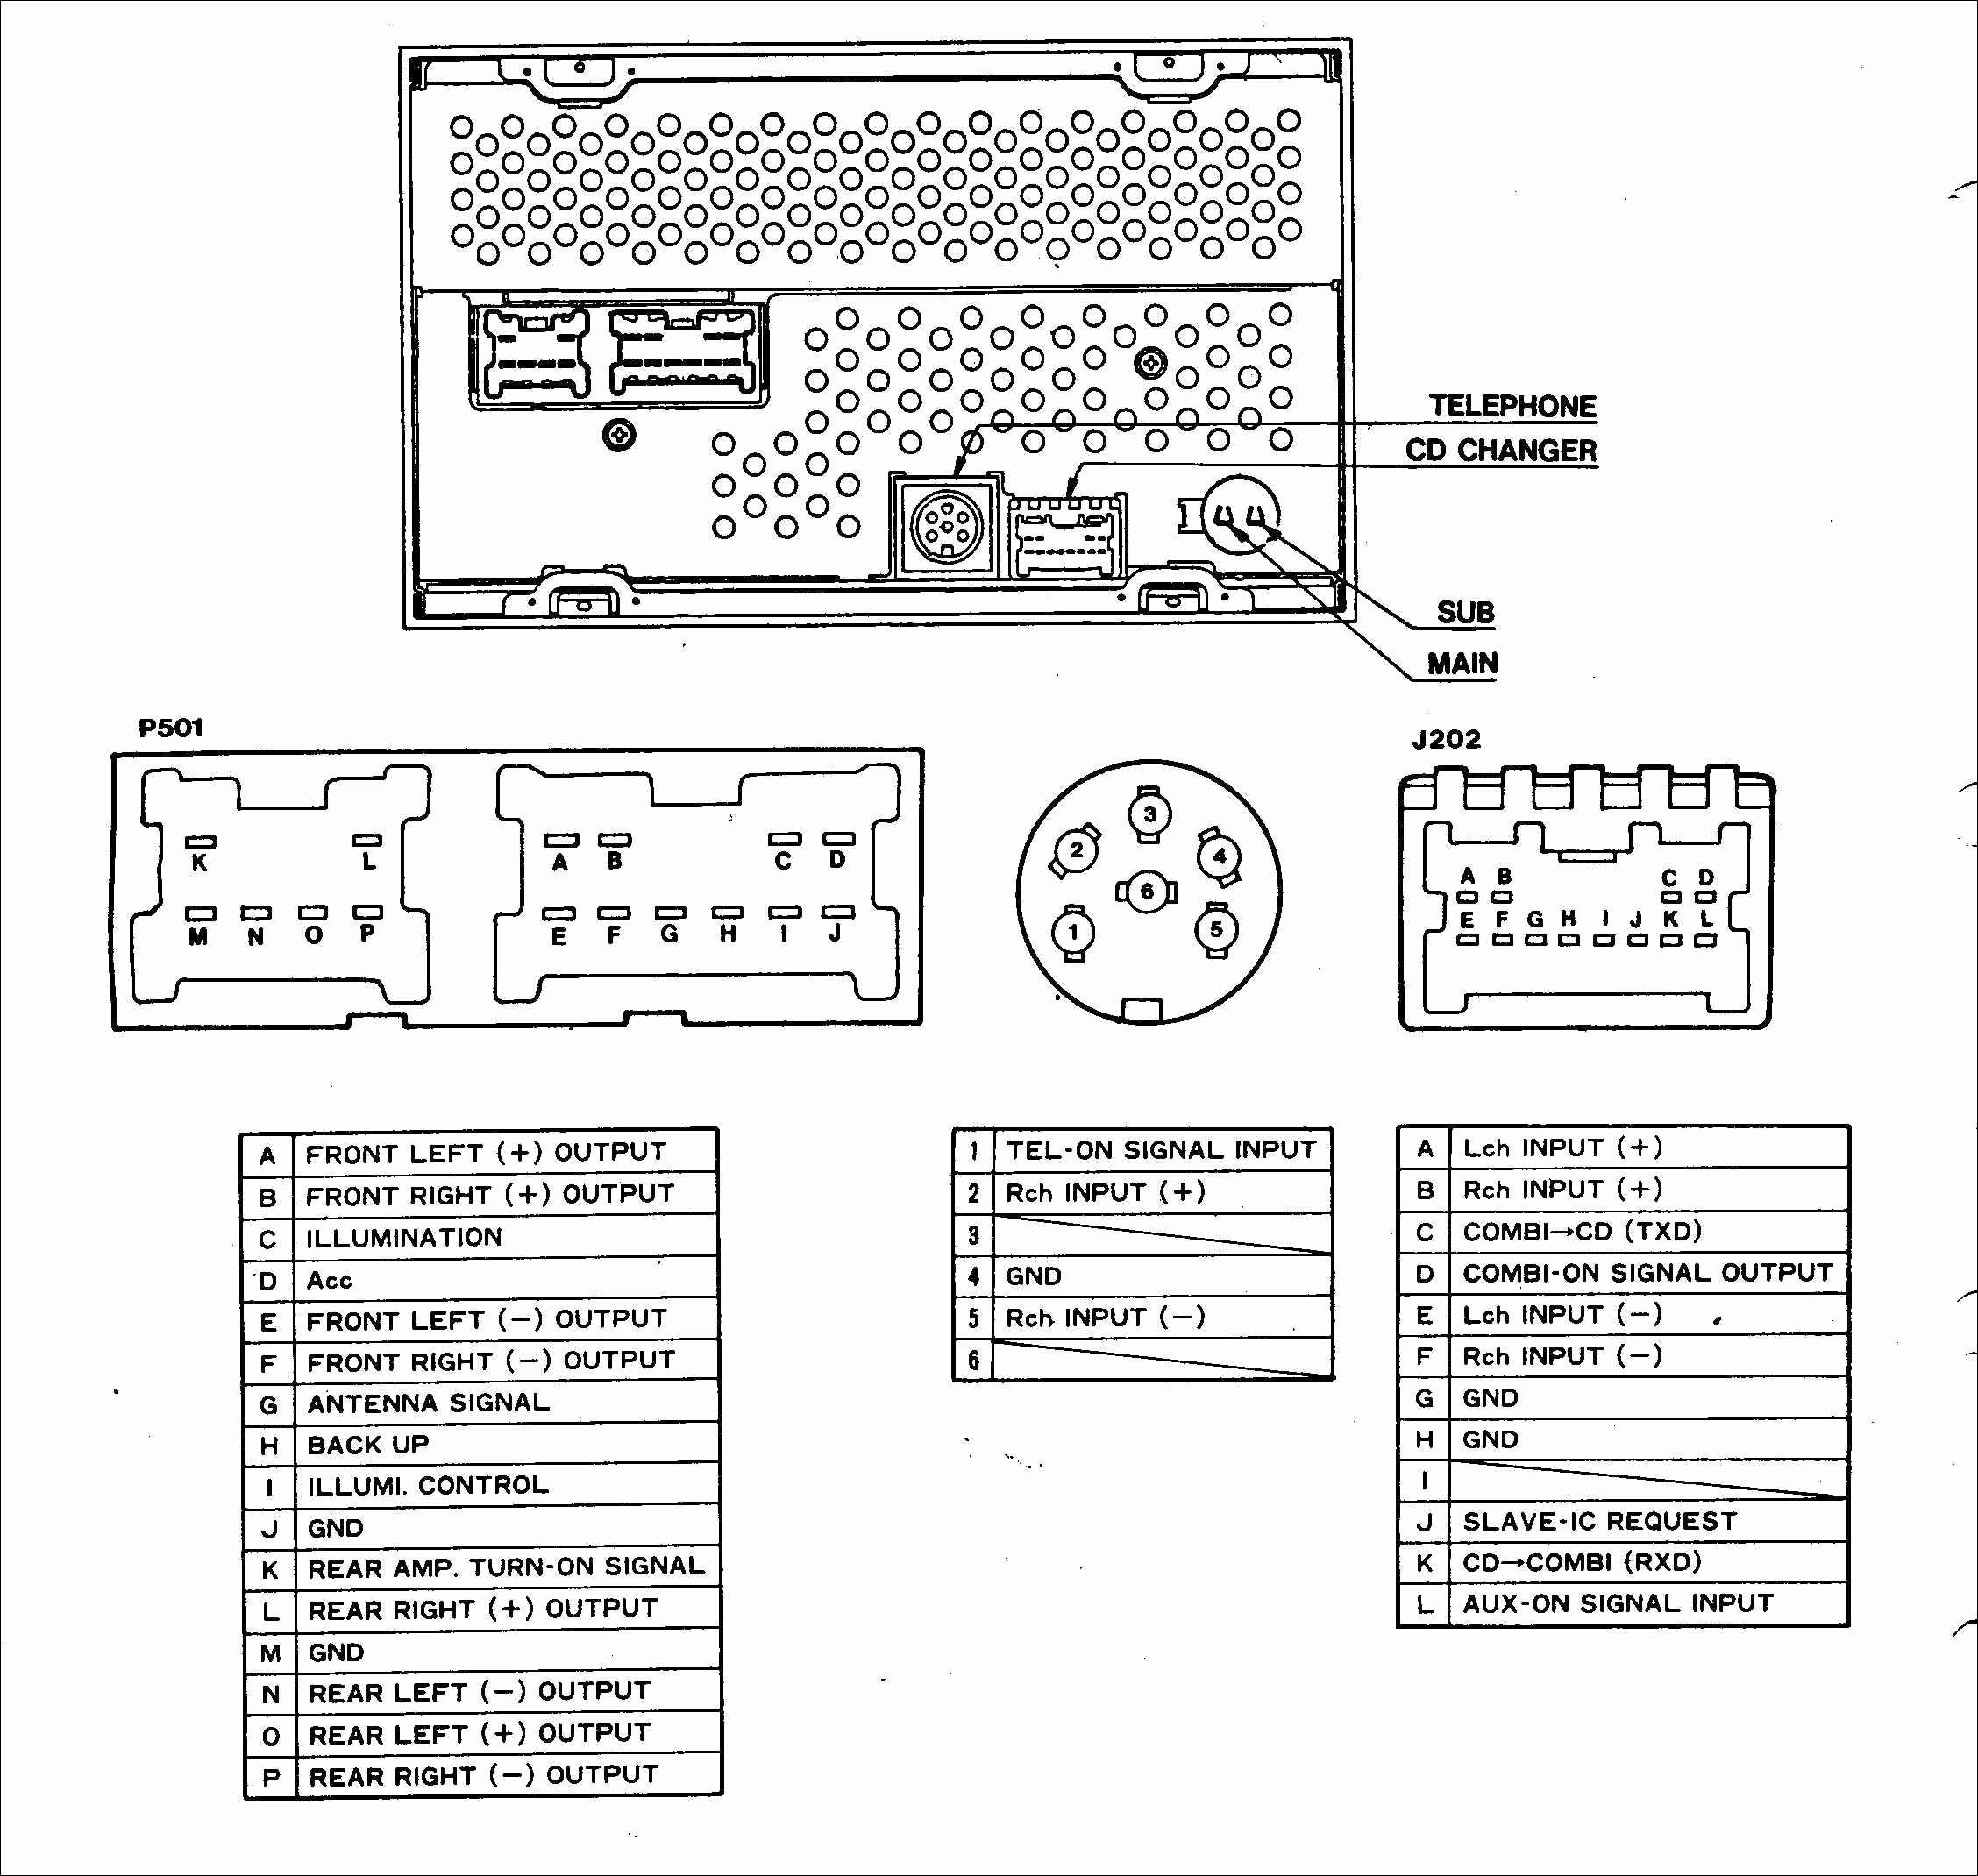 Jvc Kd R330 Wiring Diagram - Wiring Diagrams Home - Jvc Kdr330 Wiring Diagram